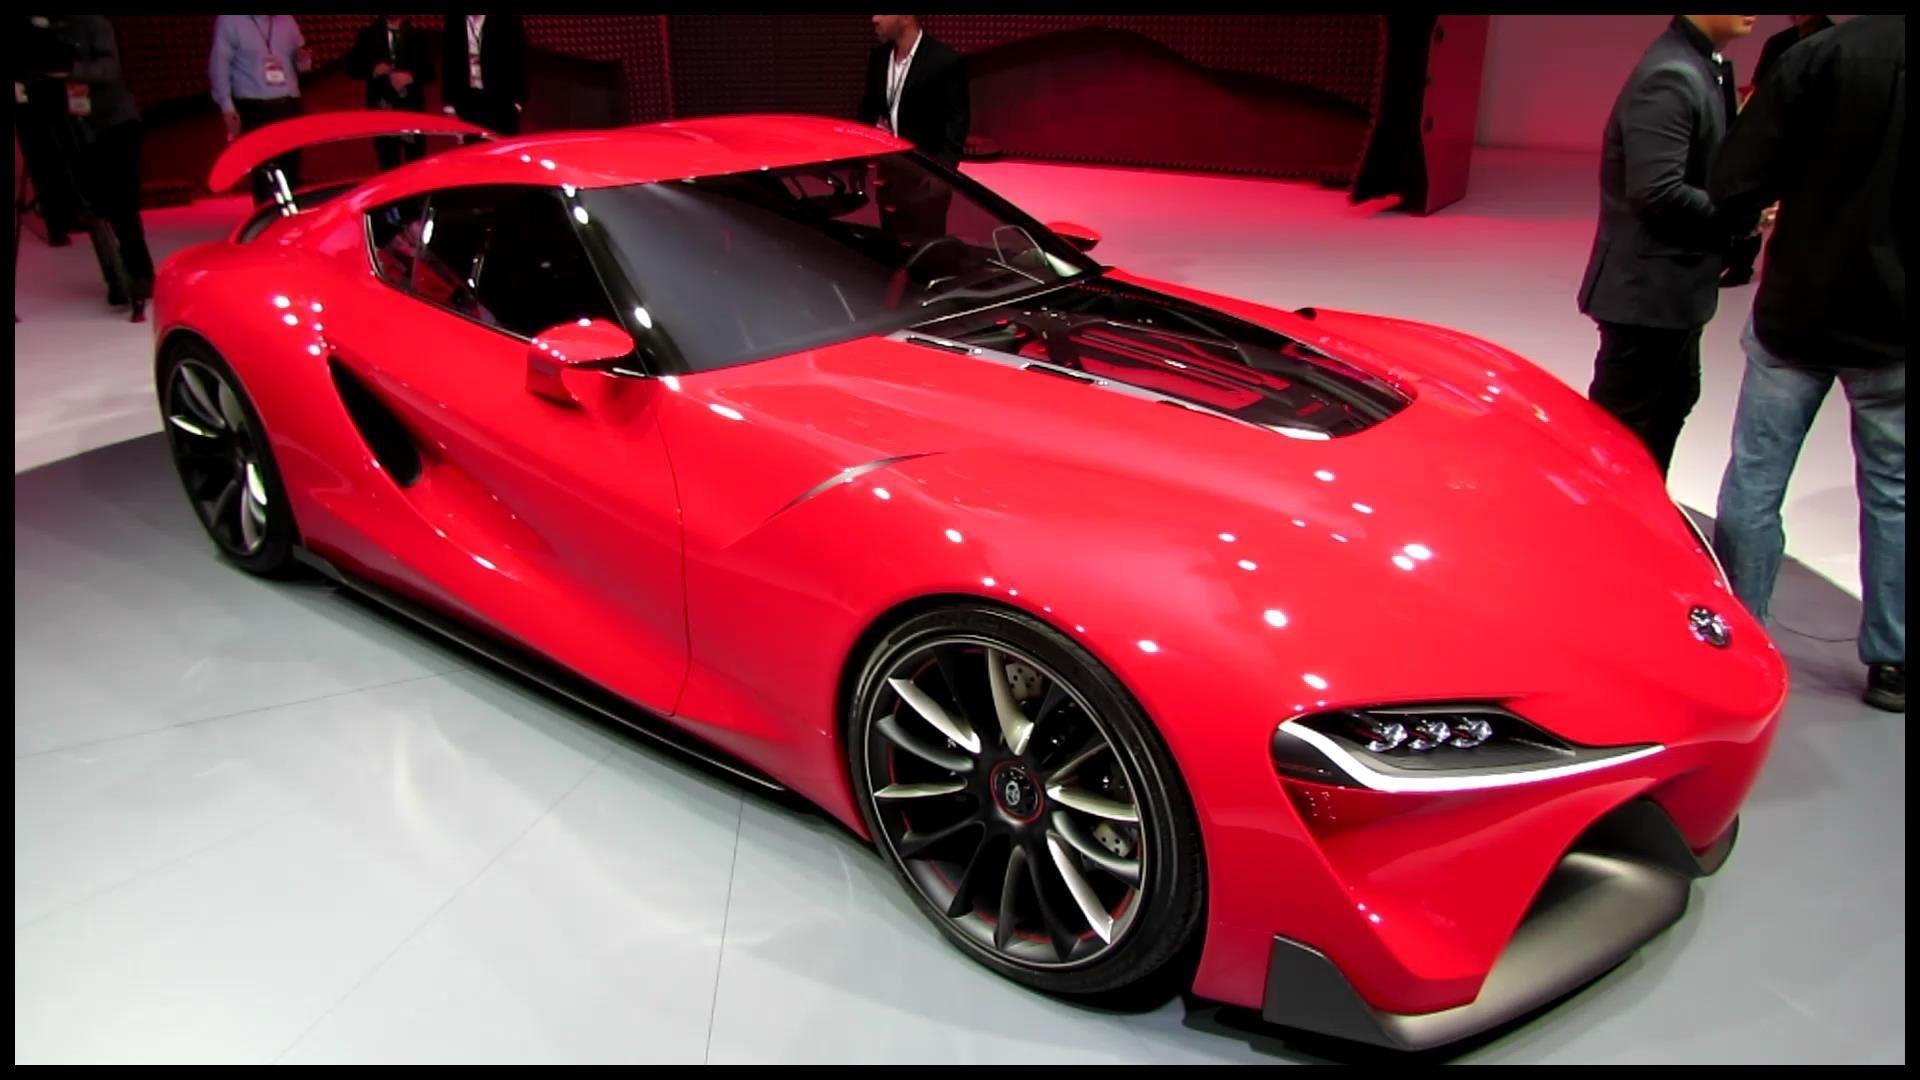 Supra 2016 New 2015 toyota Celica Supra